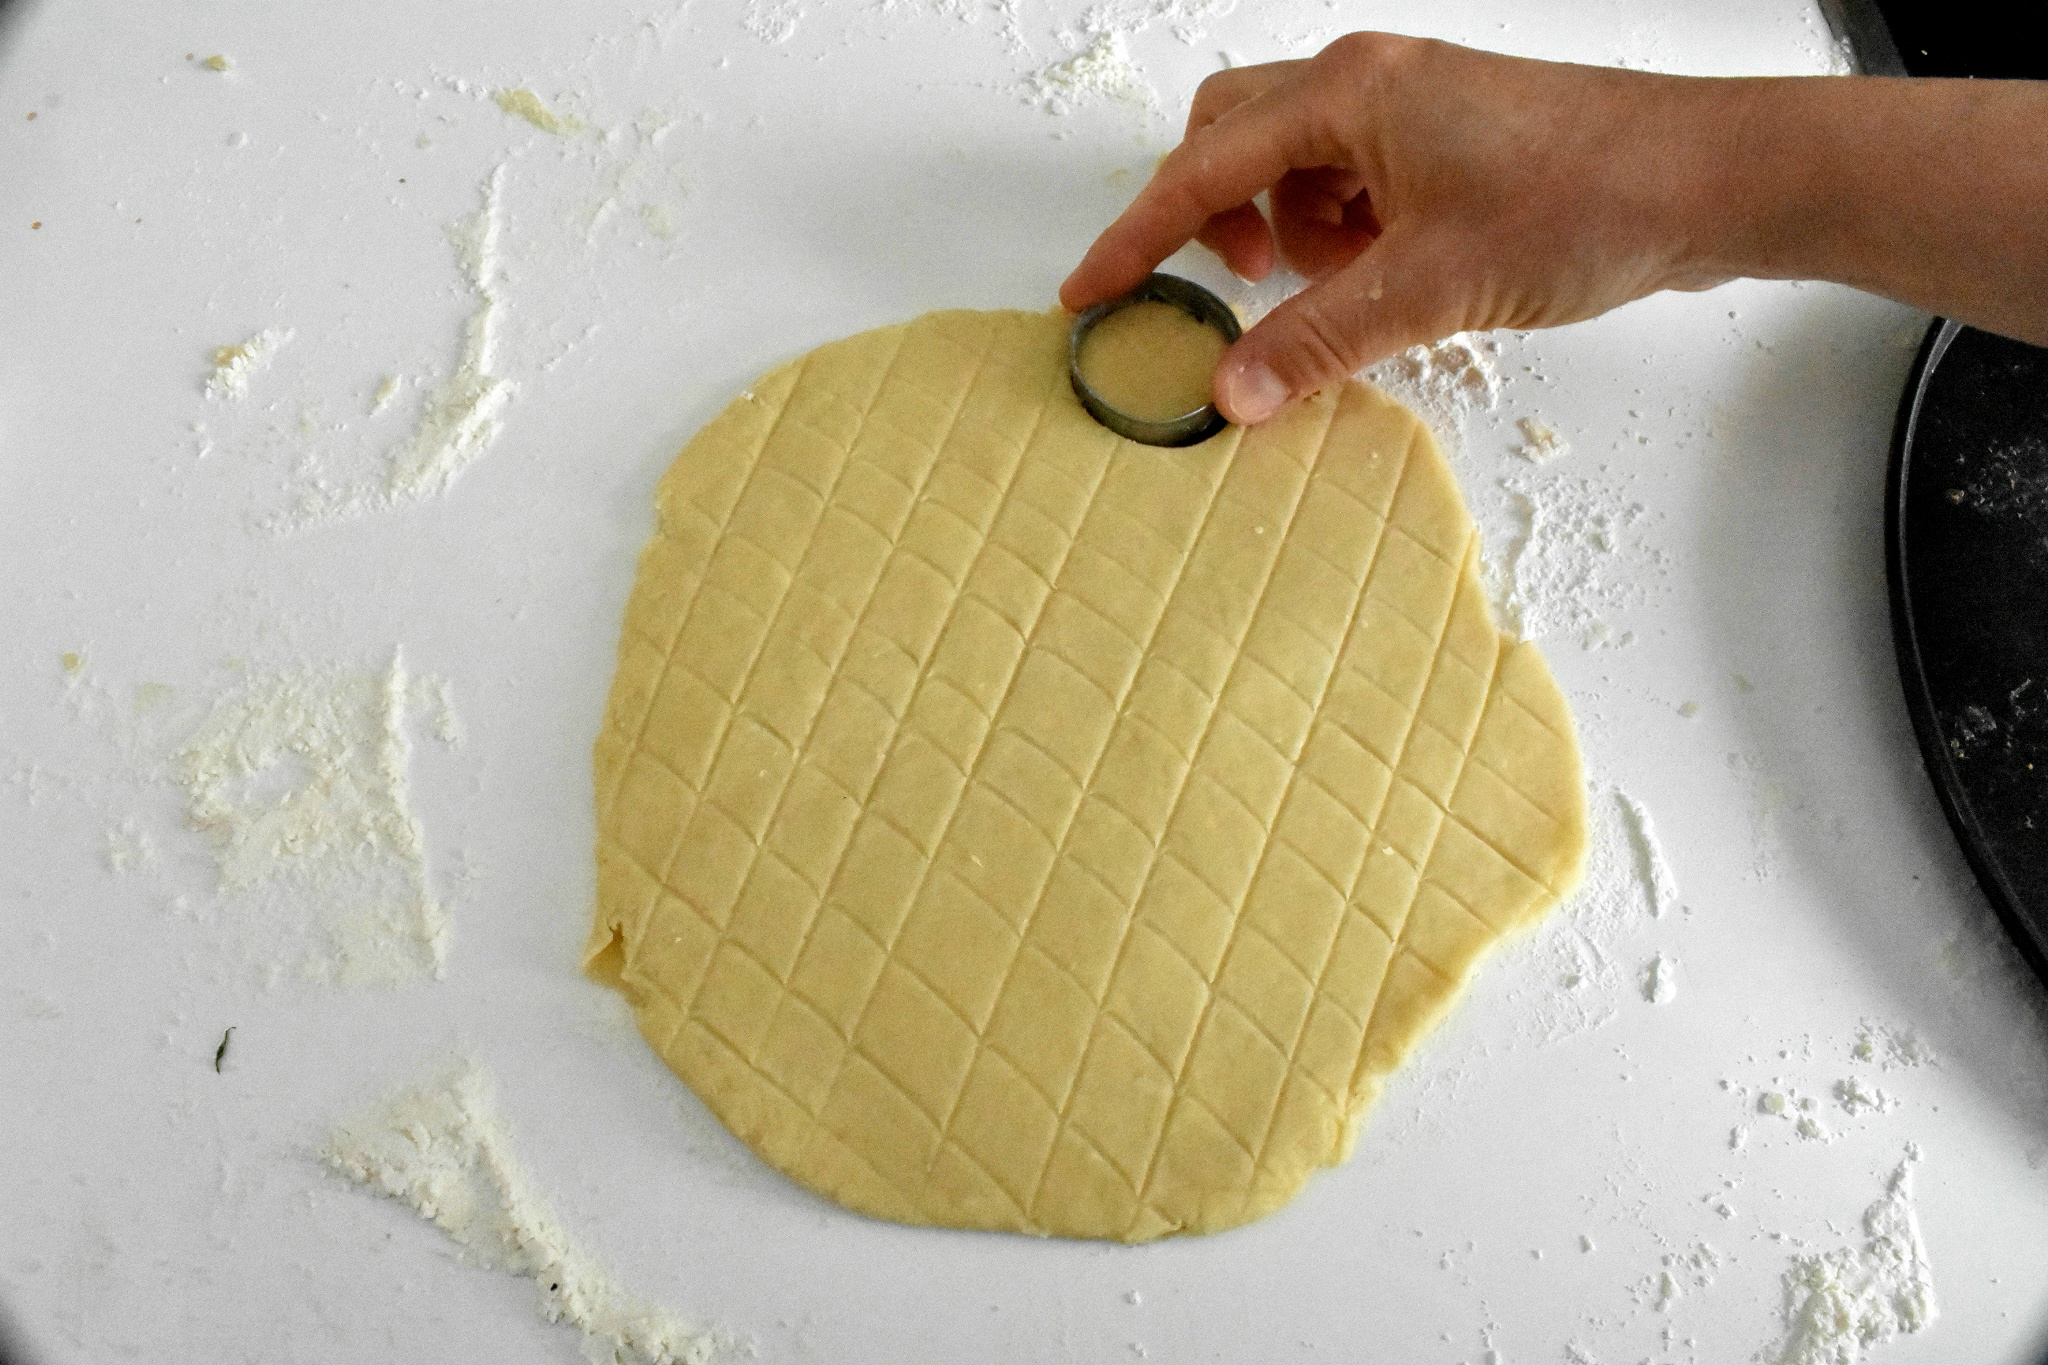 Easy-cheese-scone-recipe-process-6-SunCakeMom